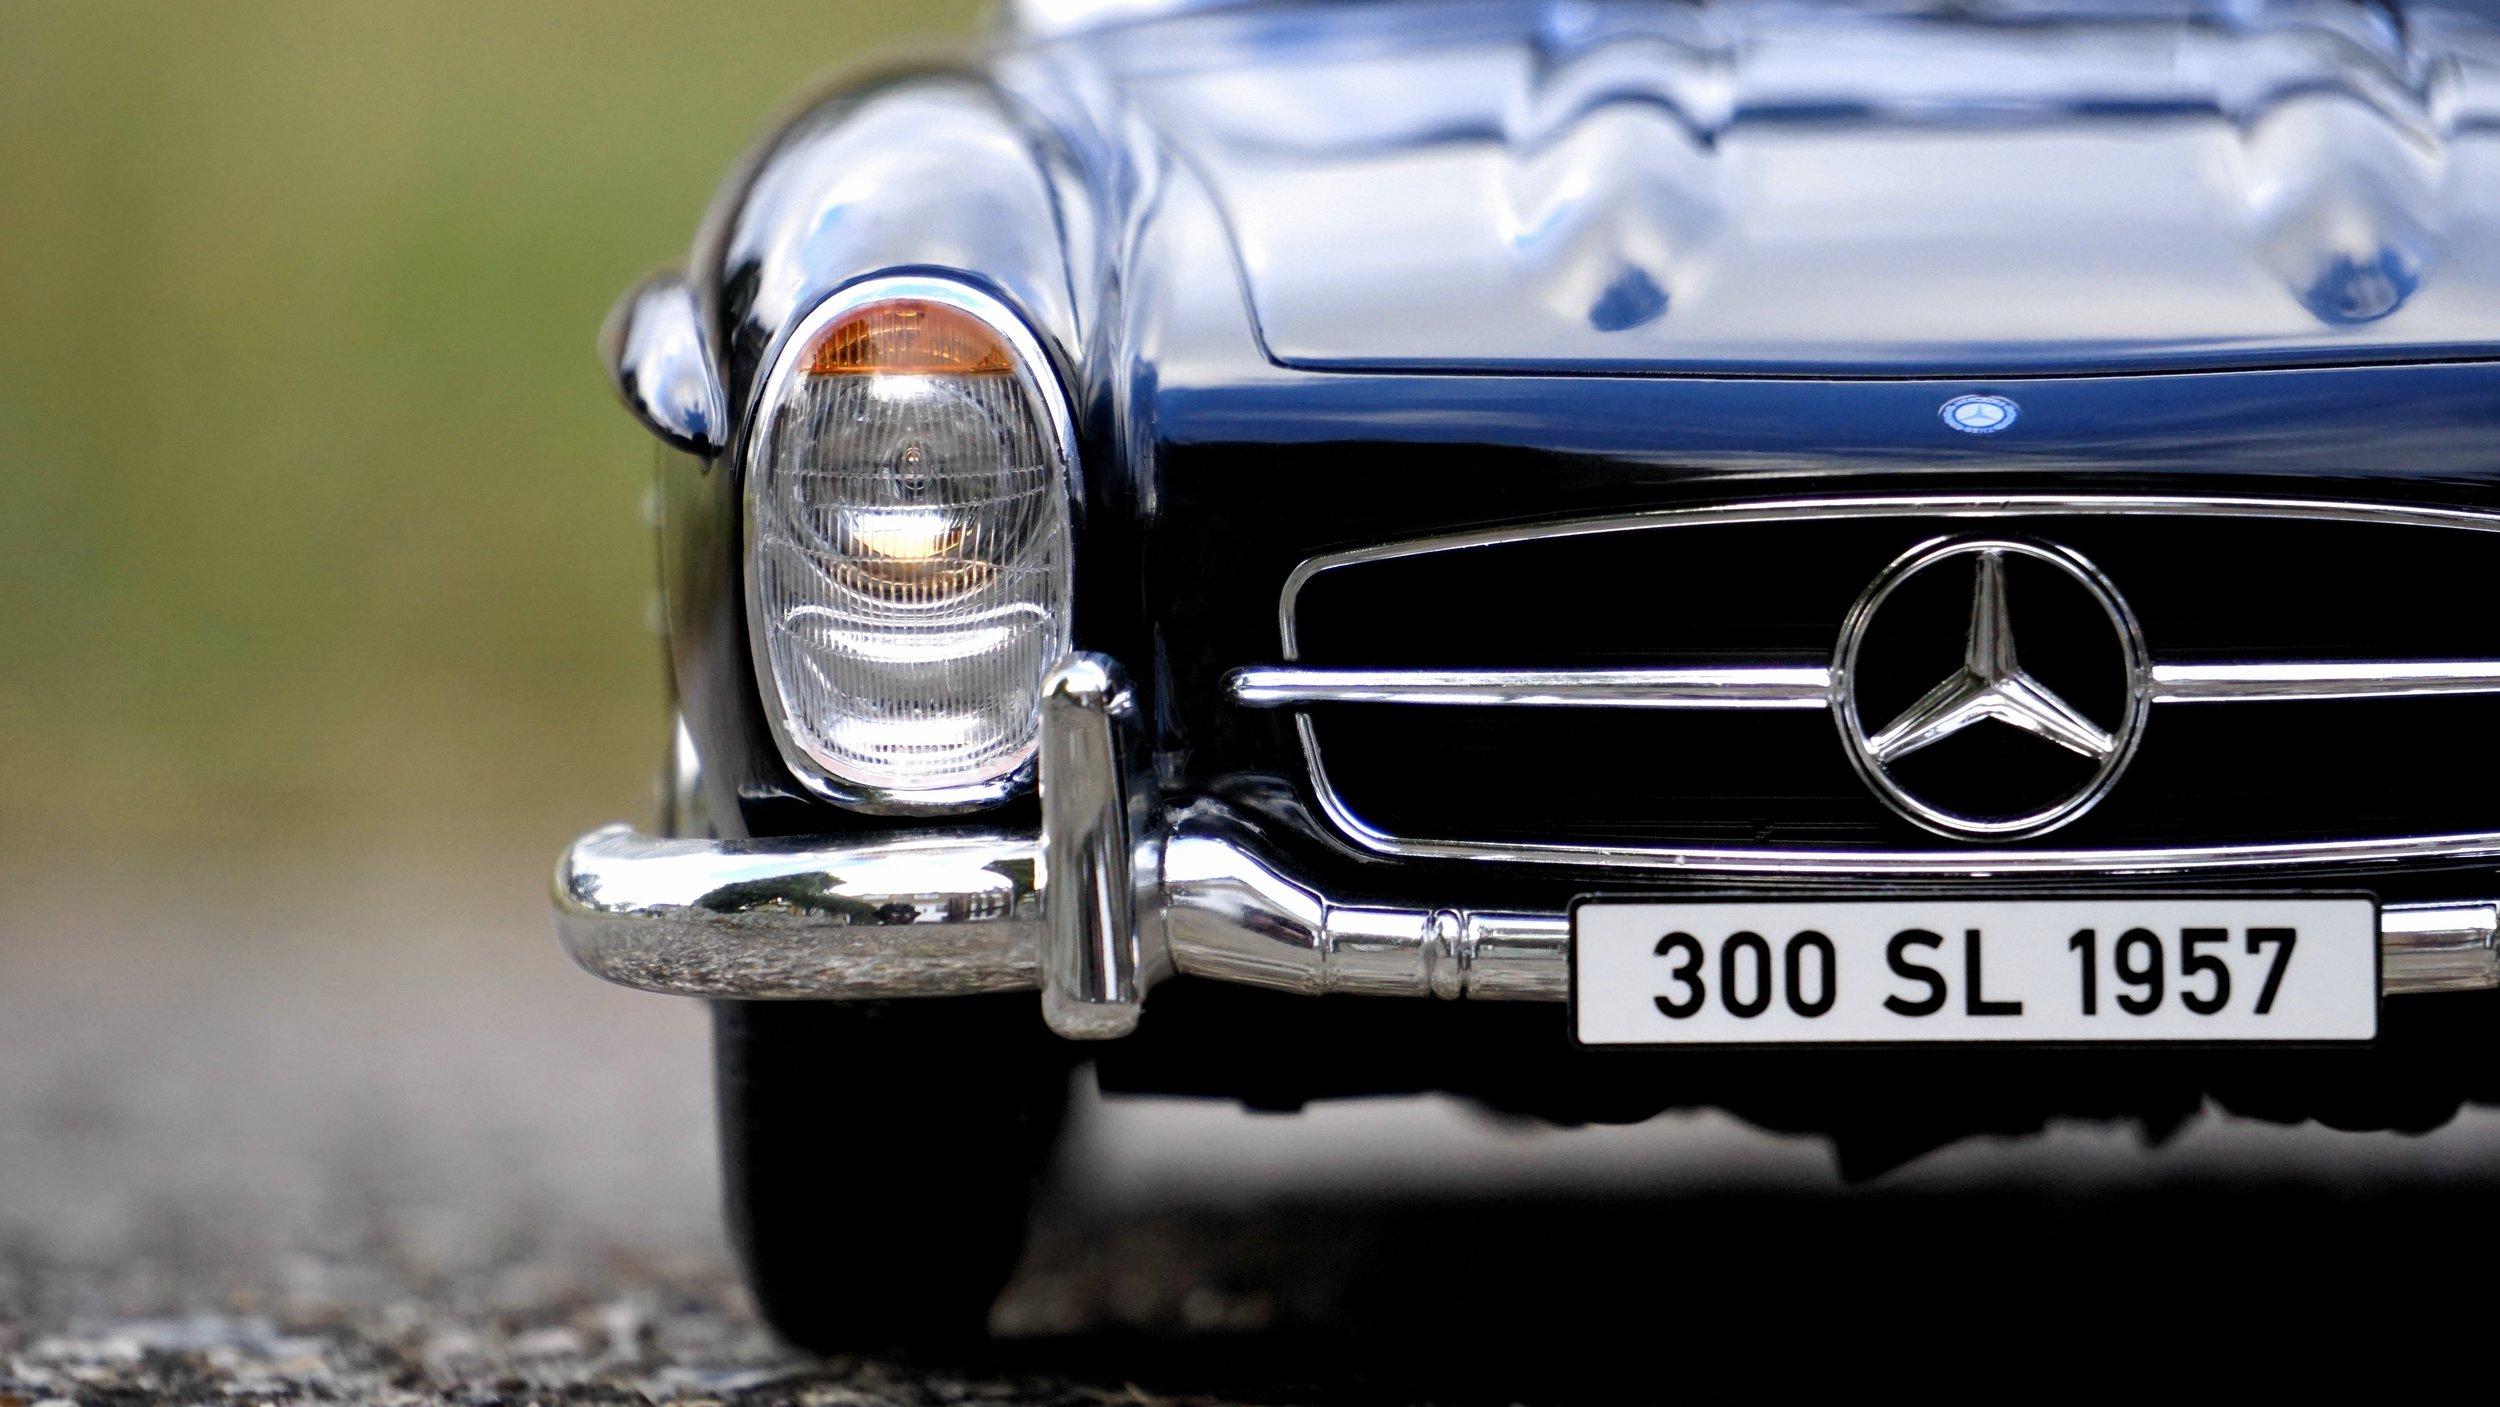 300-sl-automobile-automotive-132549.jpg